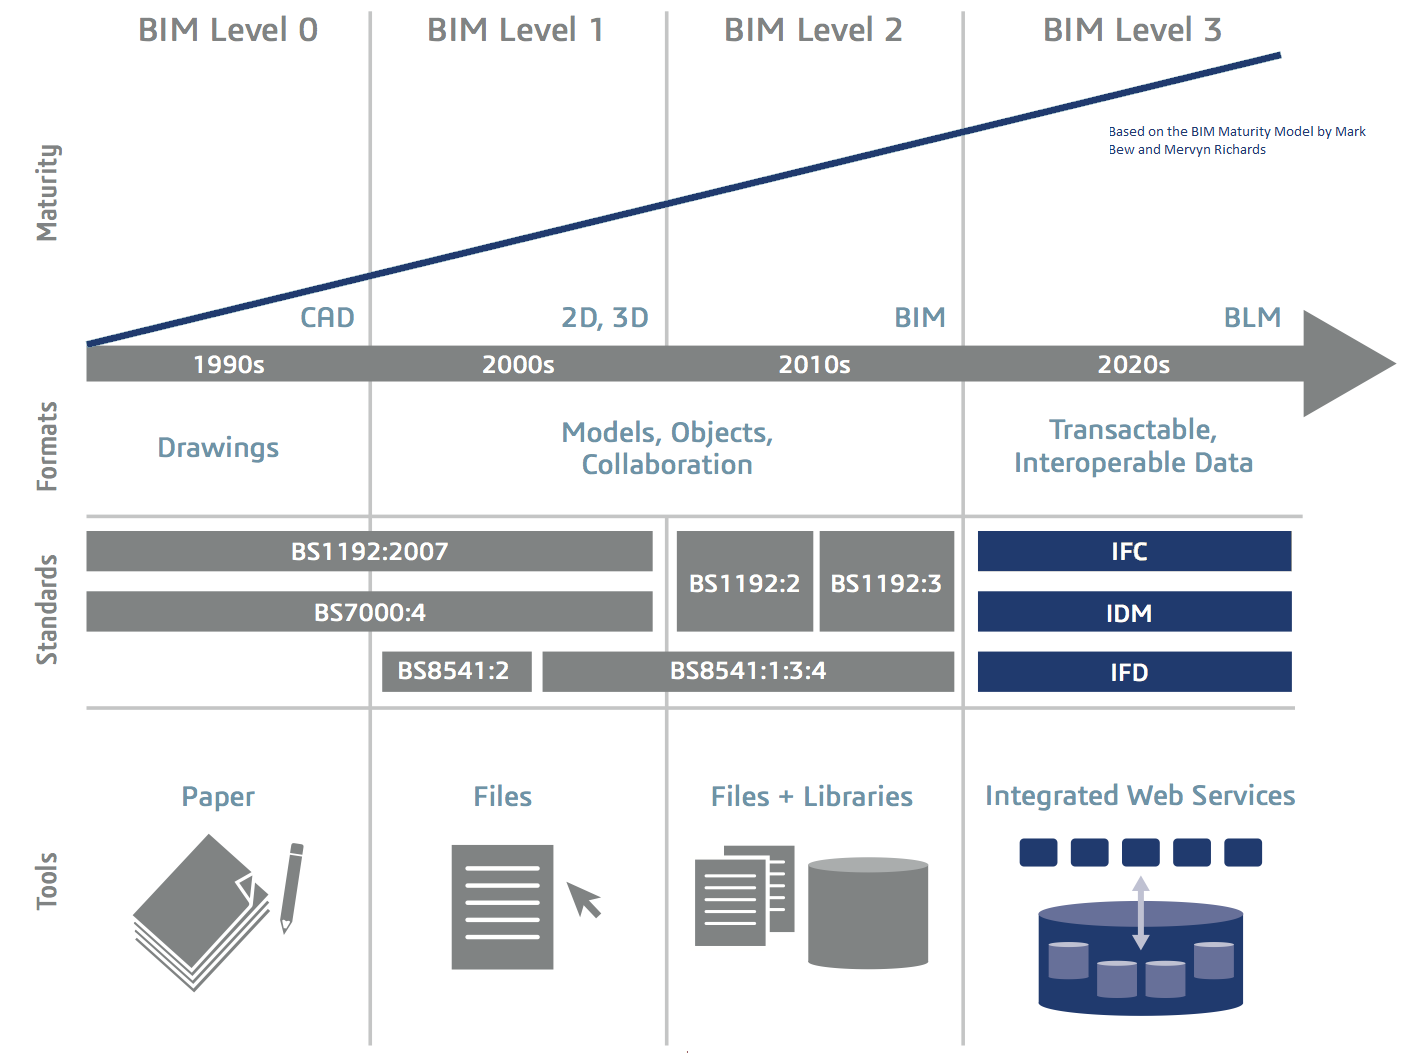 Professional Indemnity Insurance and BIM | Bim ...